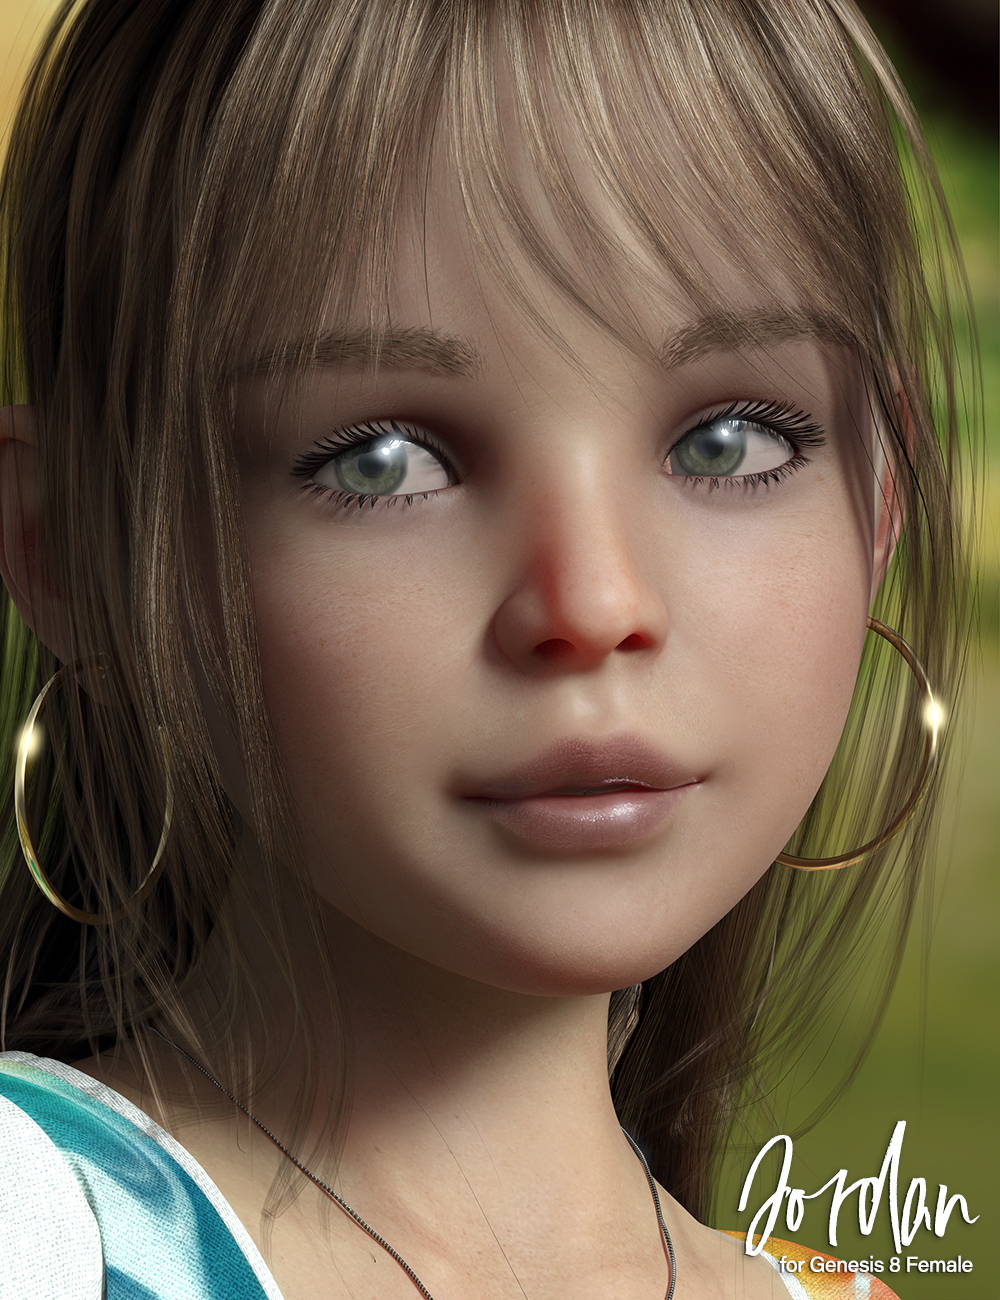 Jordan Hair for Genesis 8 Females by: 3D Universe, 3D Models by Daz 3D